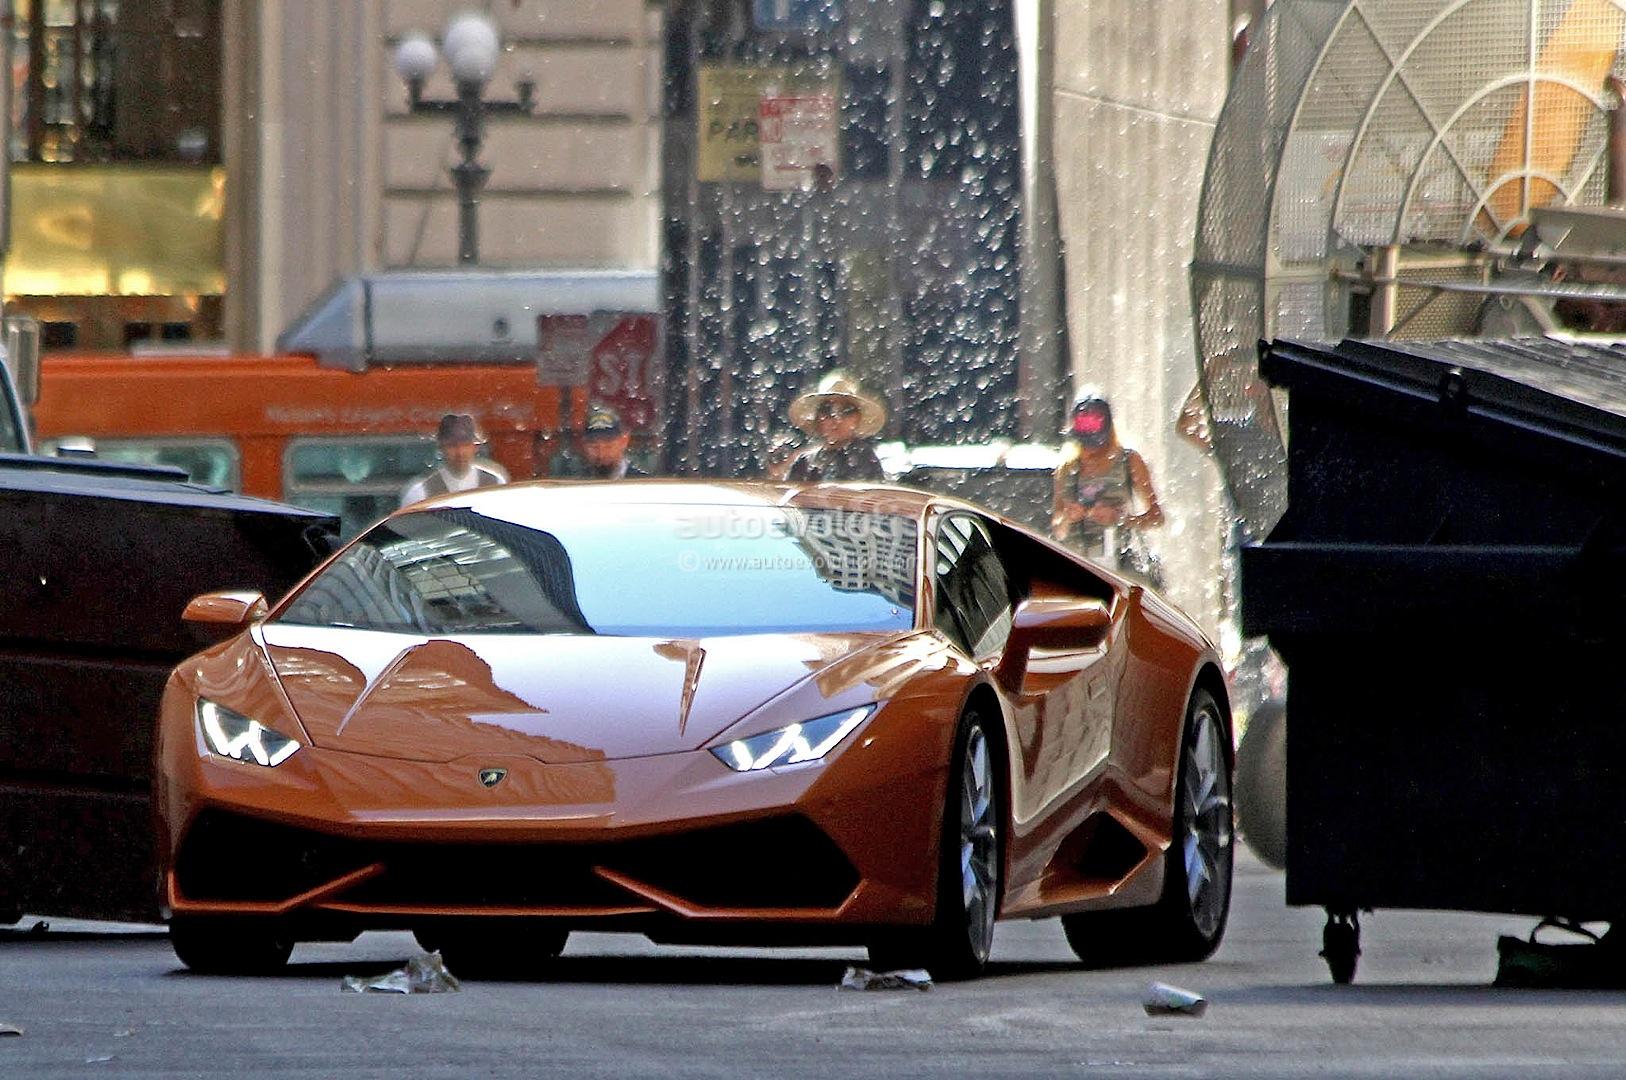 spyshots-orange-lamborghini-huracan-street-racing-in-the-us_3.jpg?1390936746